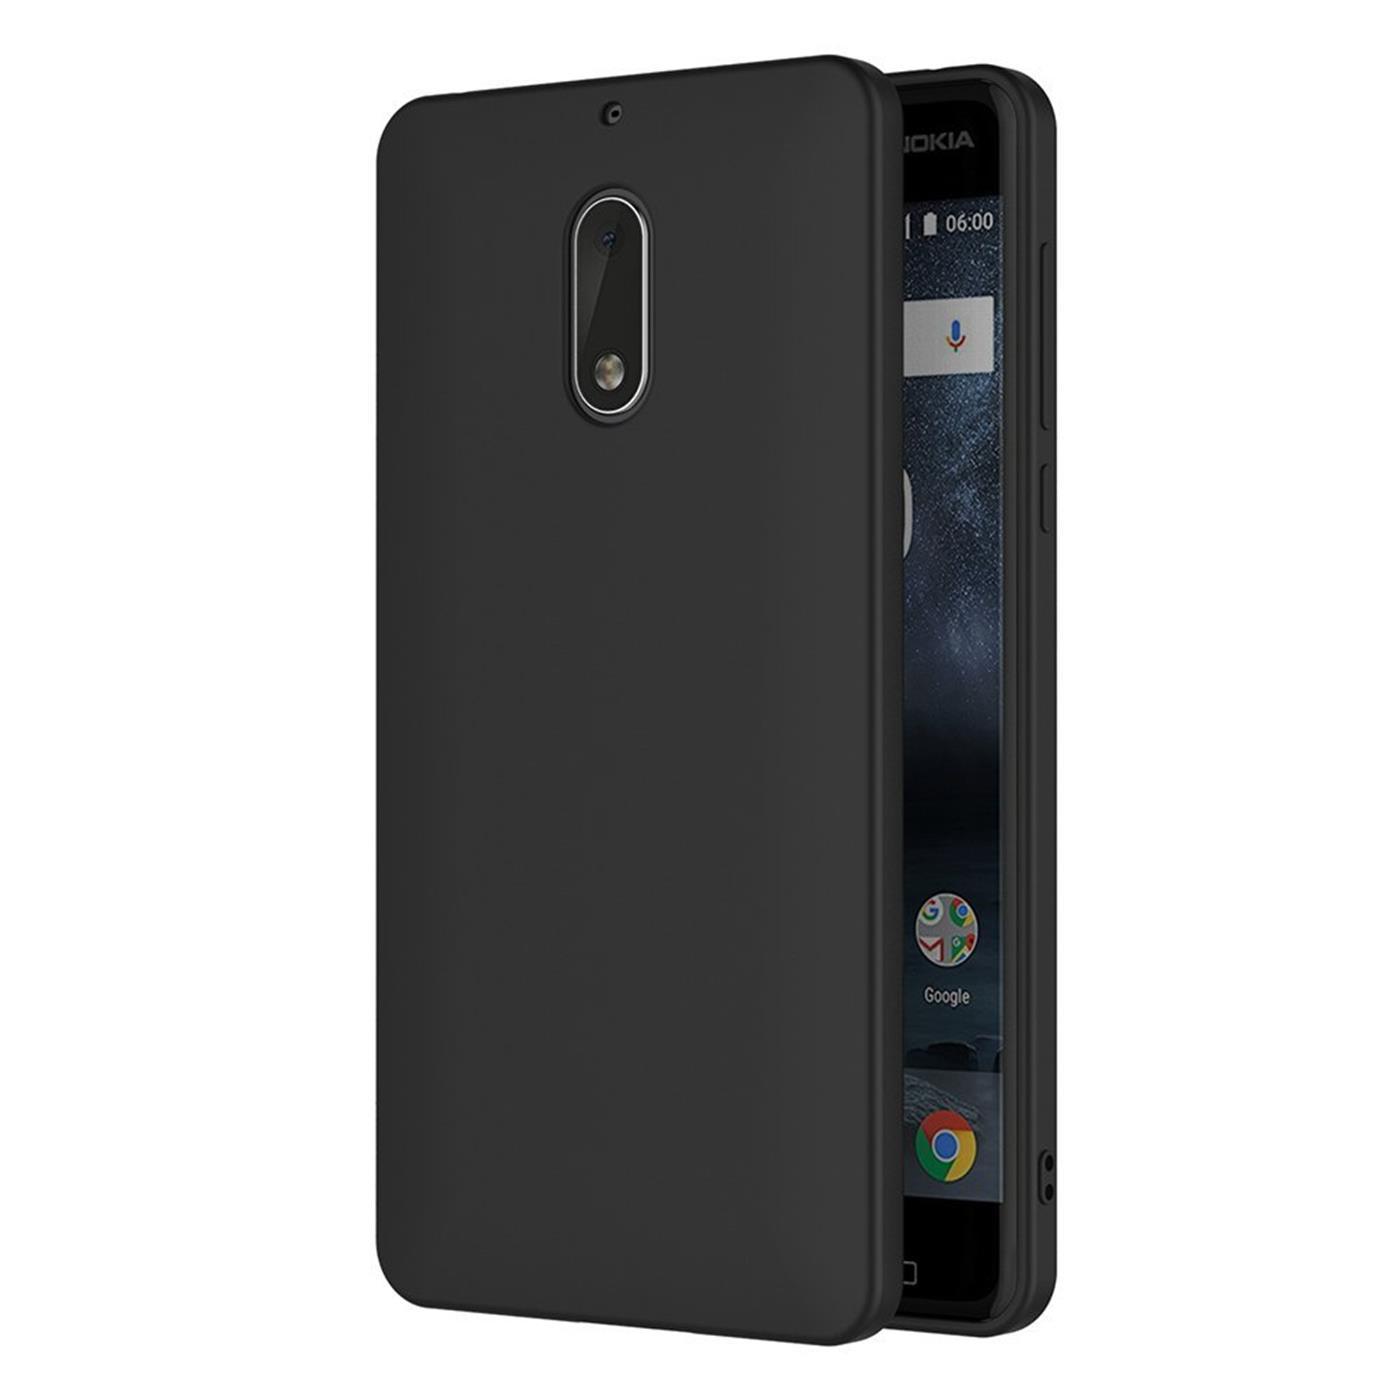 Handy-Huelle-fuer-Nokia-2-3-5-6-7-8-Case-Schutzhuelle-Silikon-Tasche-Duenn-Backcover